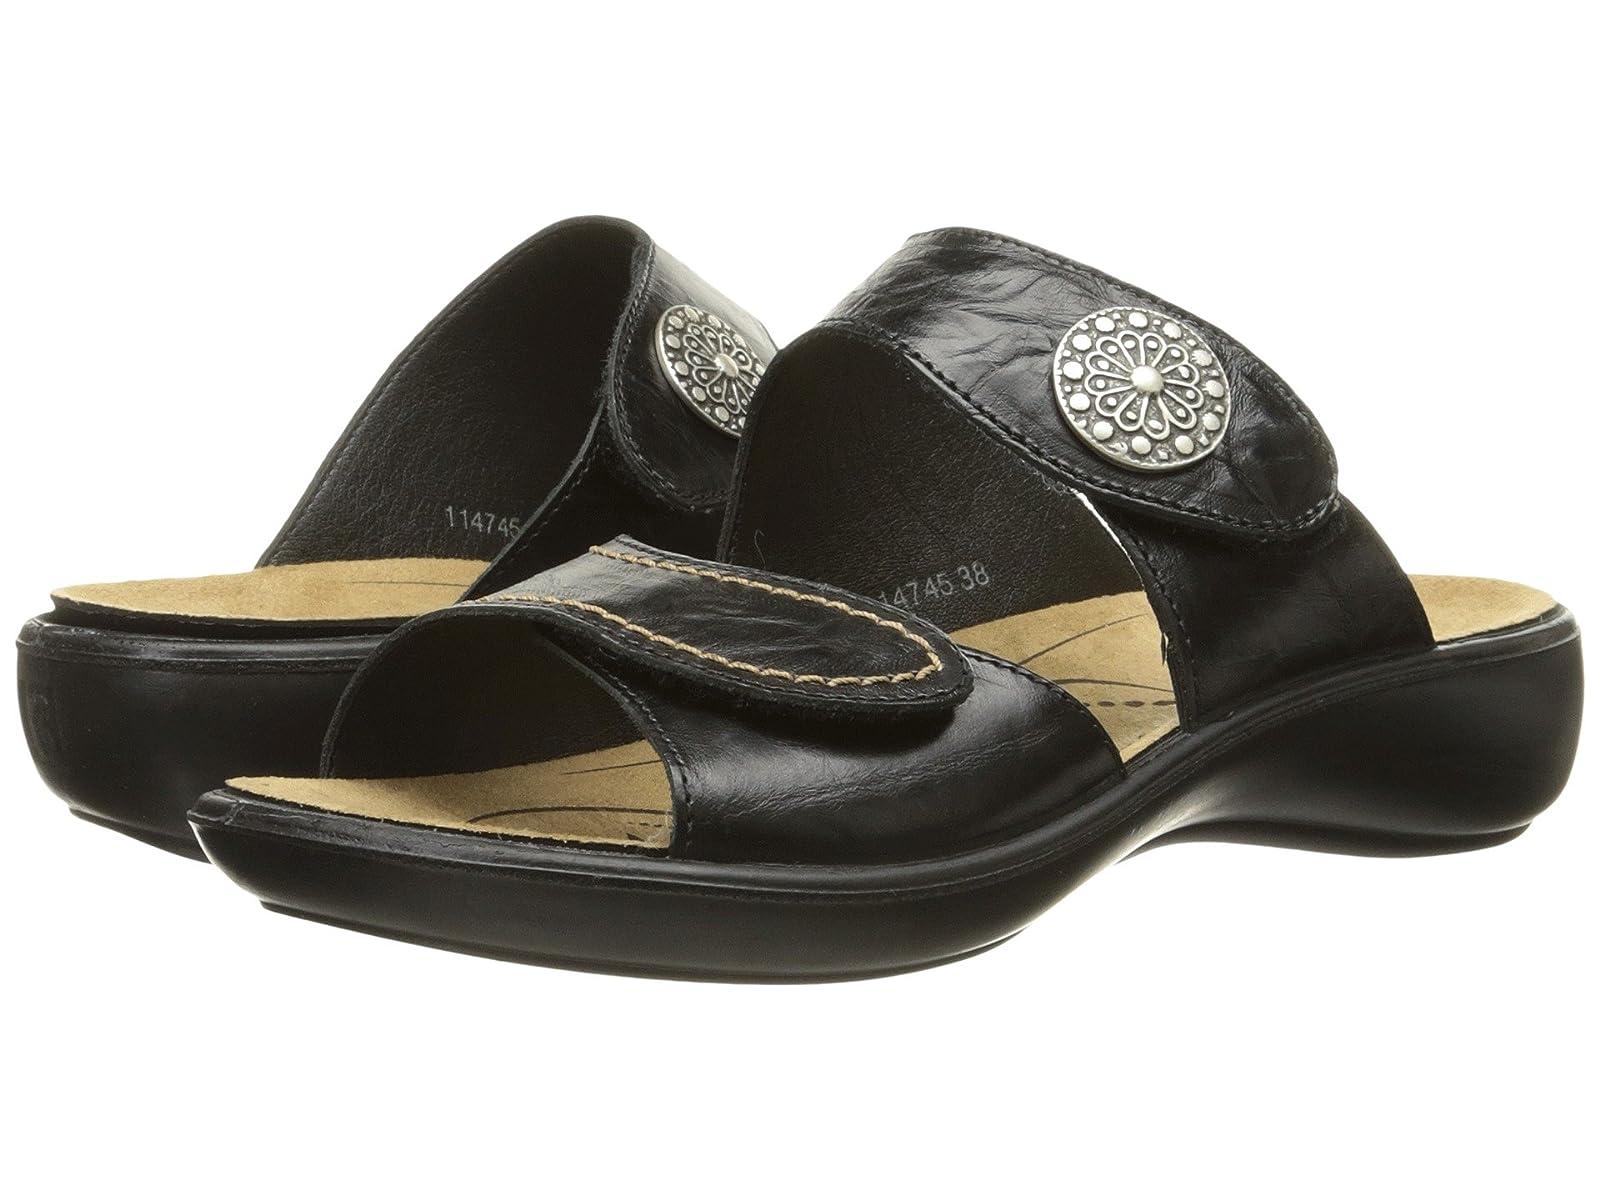 Romika Ibiza 64Cheap and distinctive eye-catching shoes